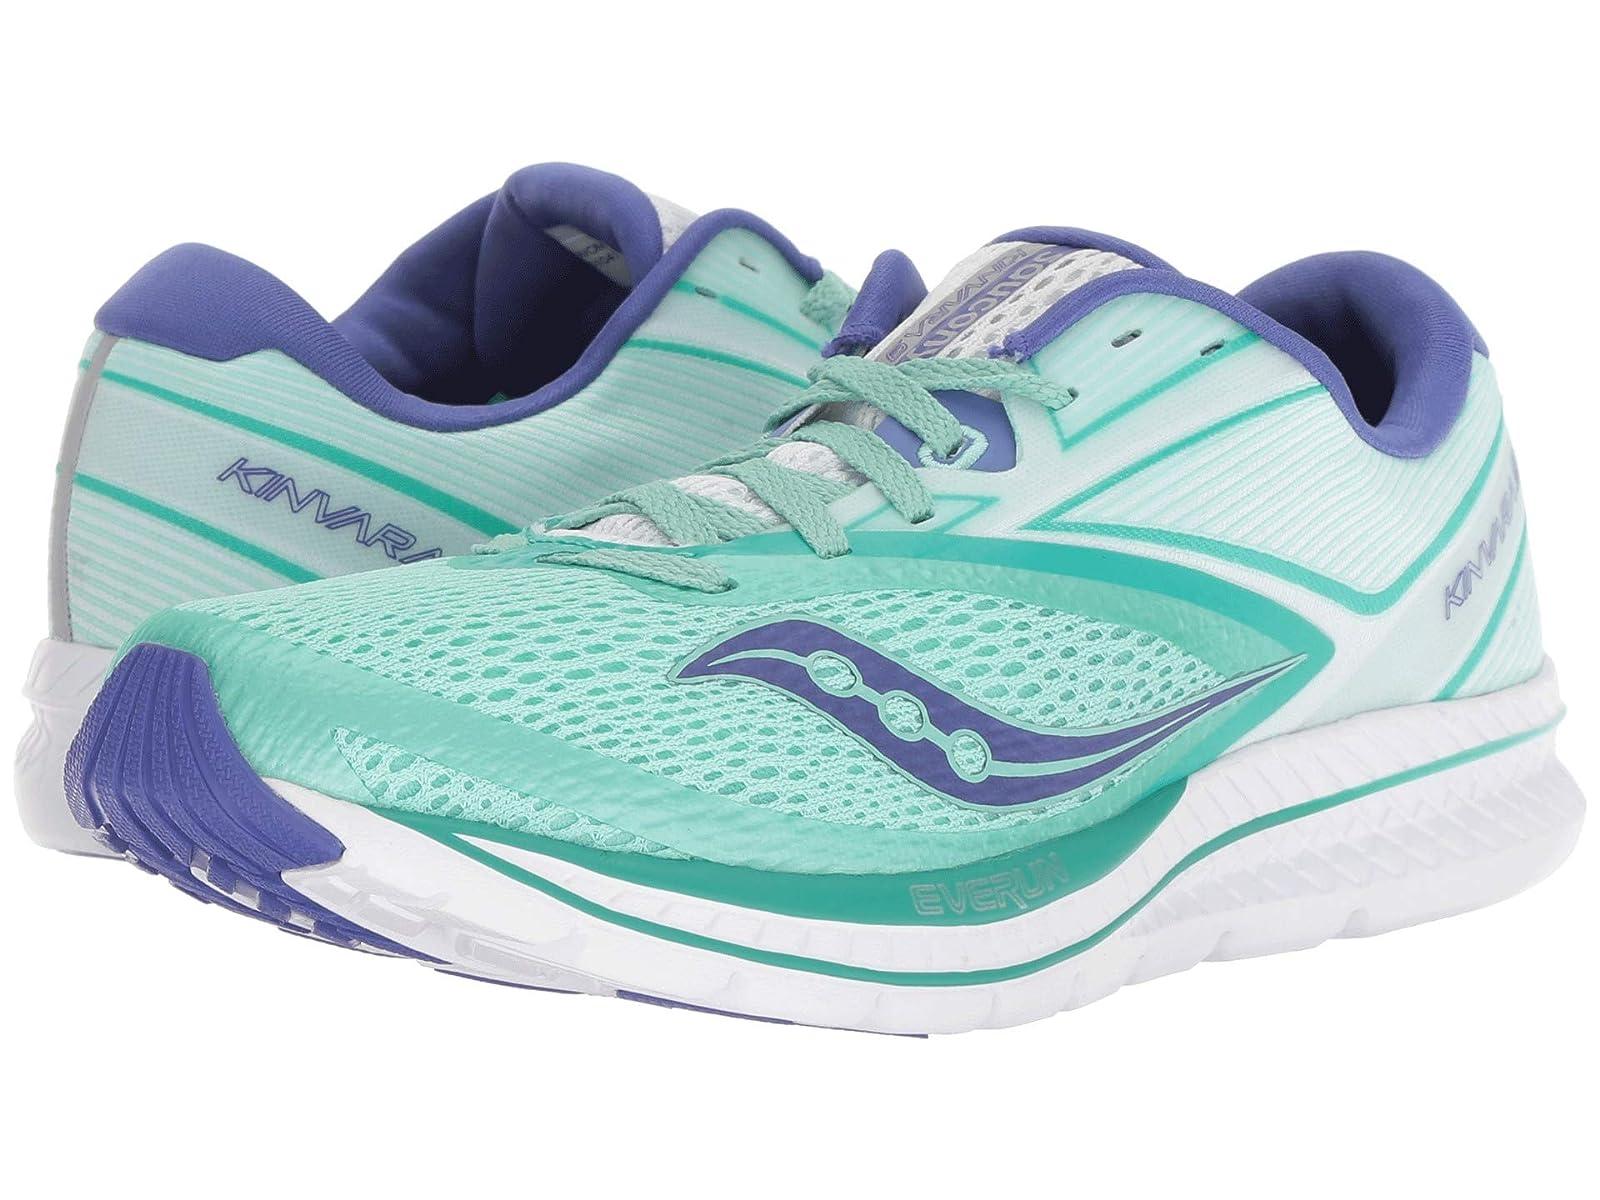 Saucony Kinvara 9Atmospheric grades have affordable shoes